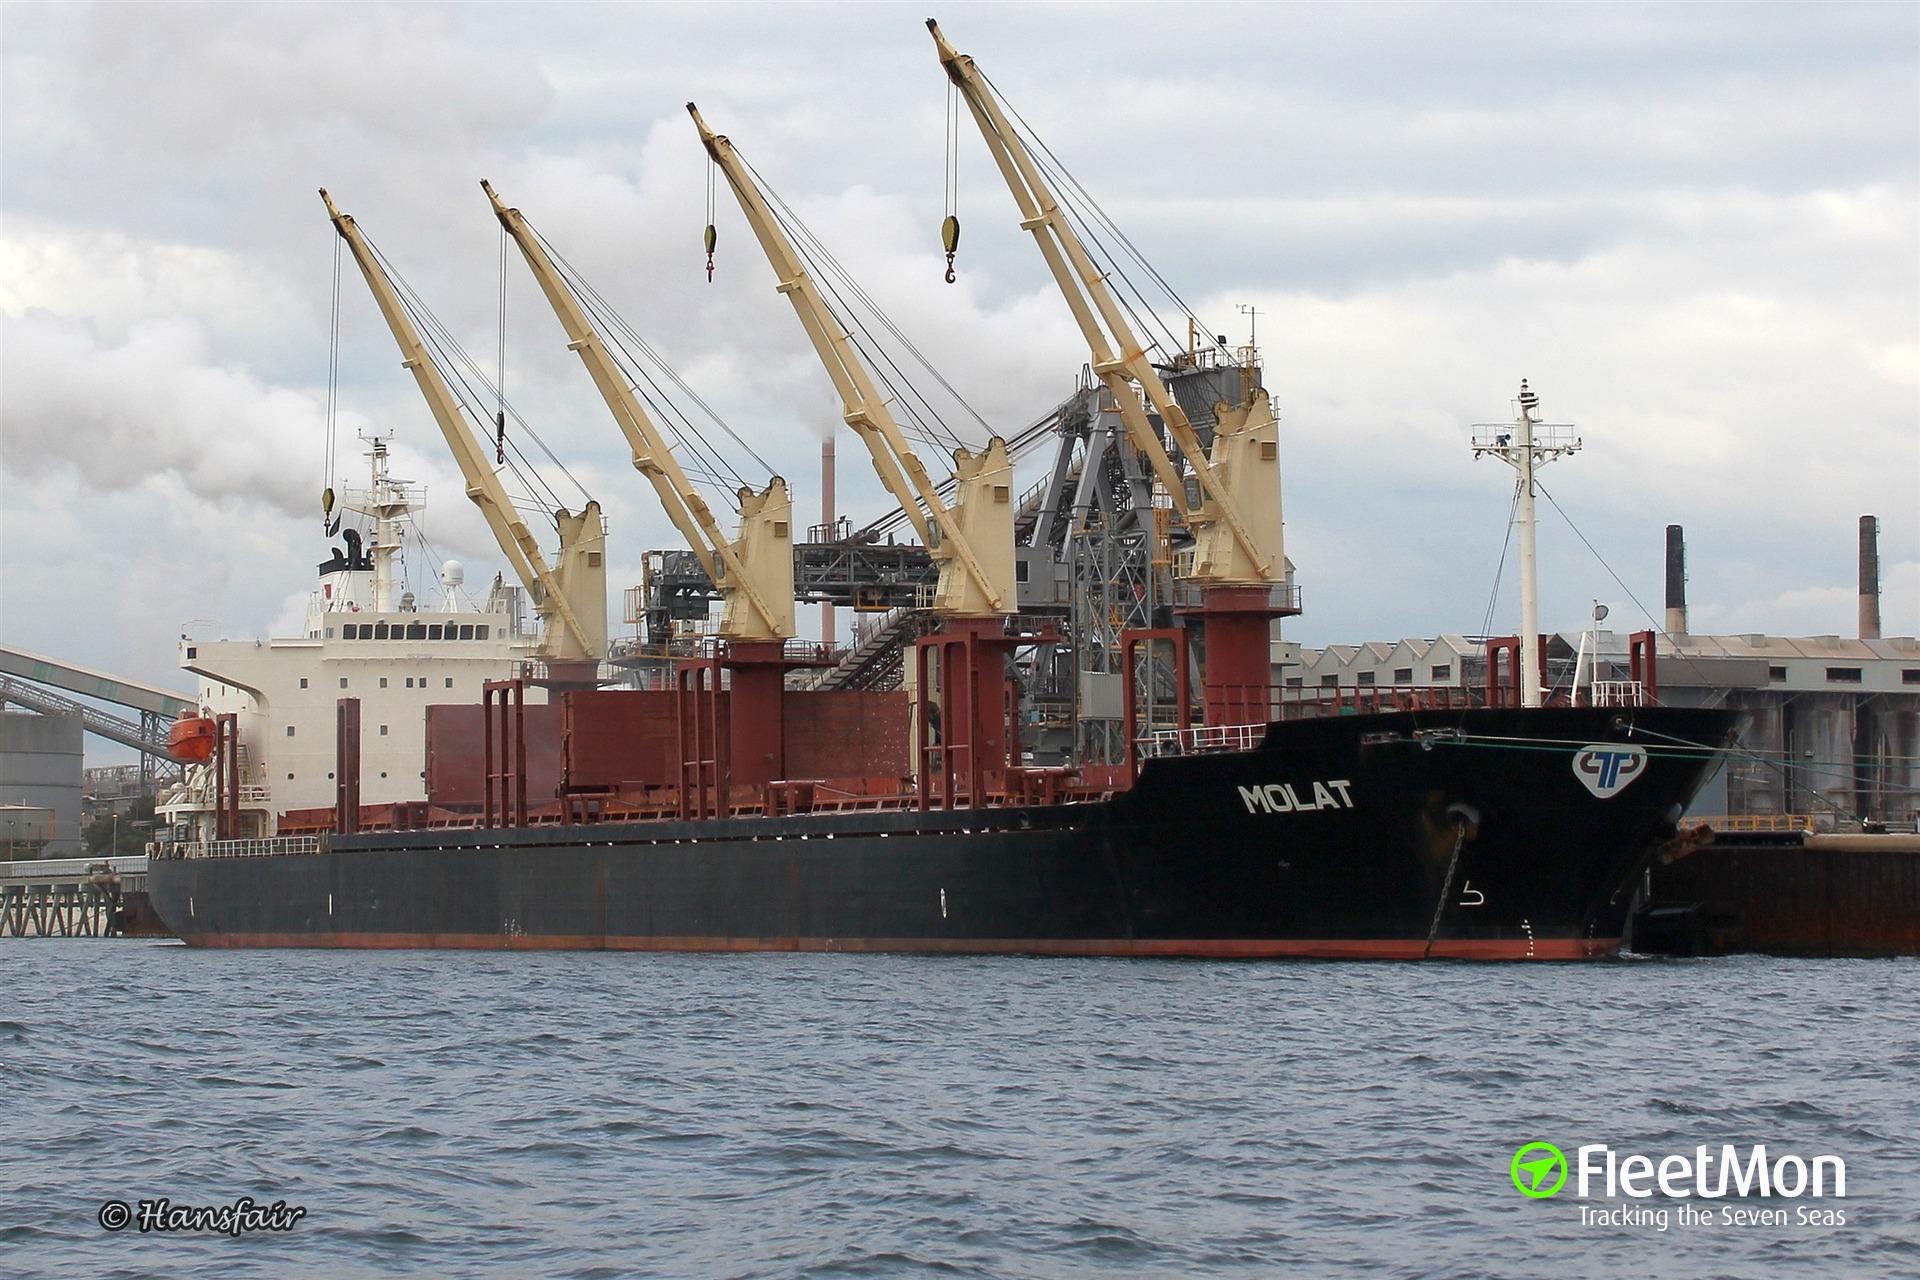 Bulk carrier MOLAT stranded off Tauranga since Sep 6